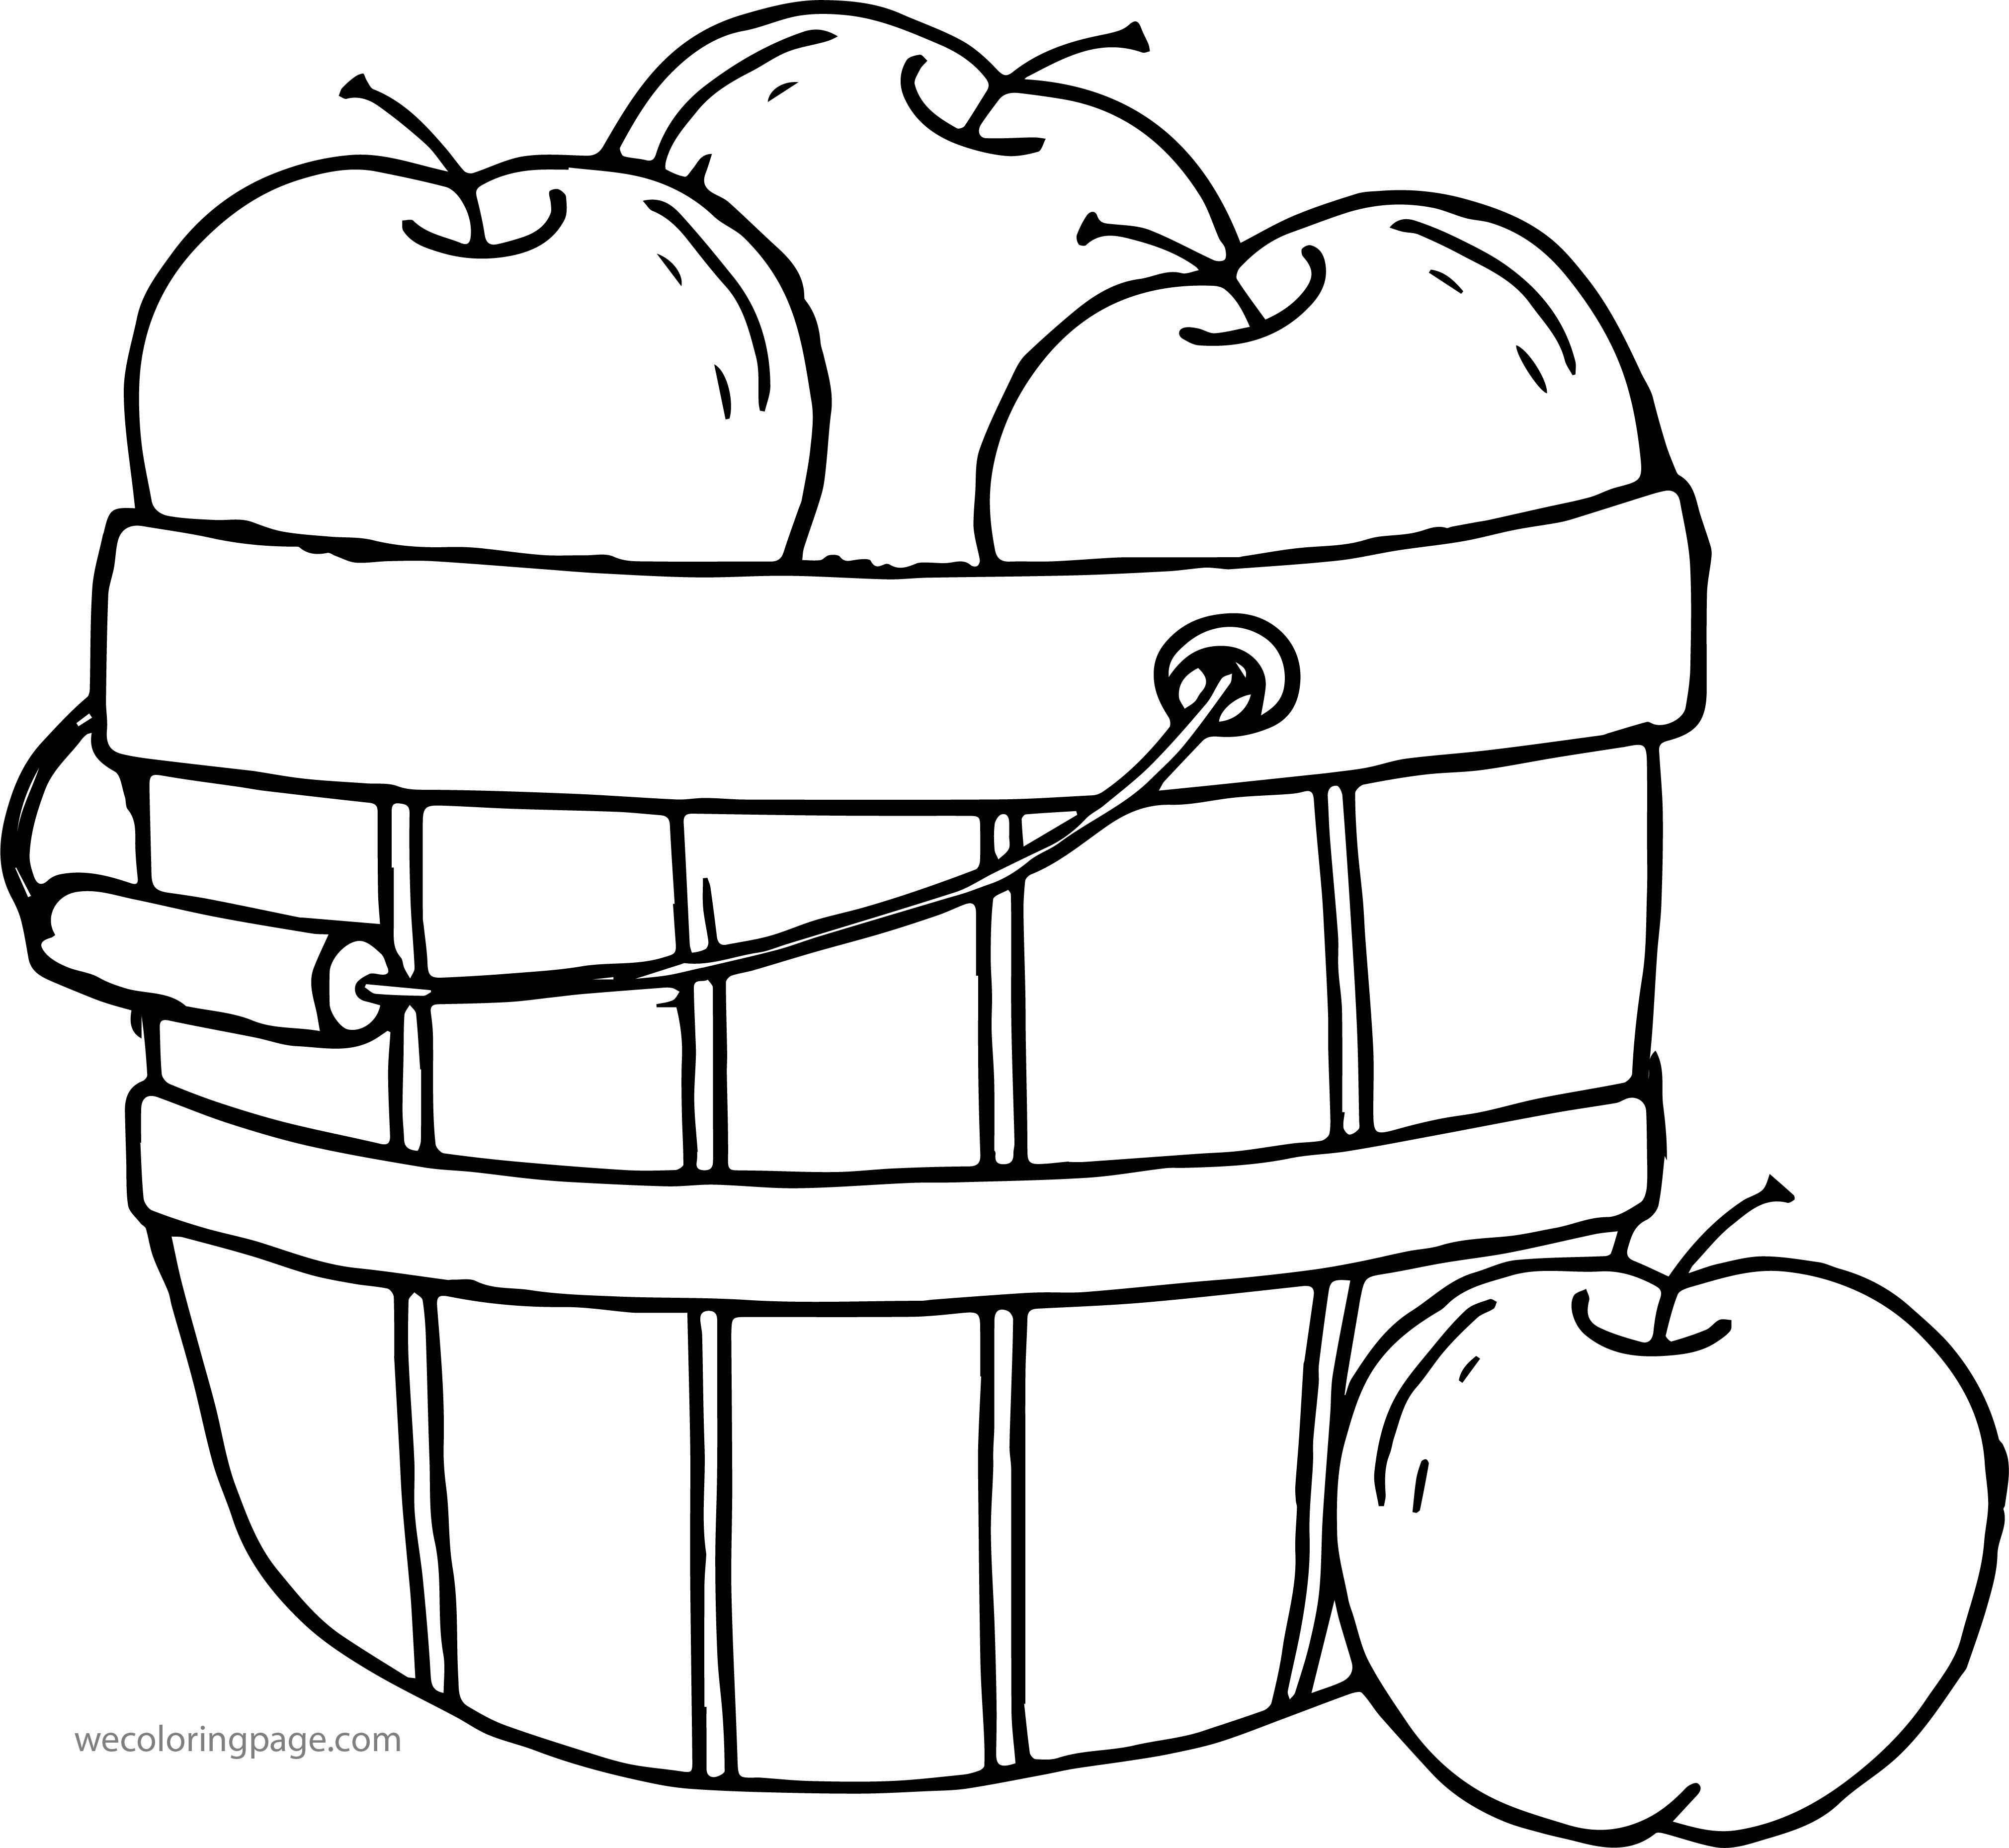 Pin By Marta Mirla Pantoja Perez On Wecoloringpage Apple Coloring Pages Fall Coloring Pages Coloring Pages